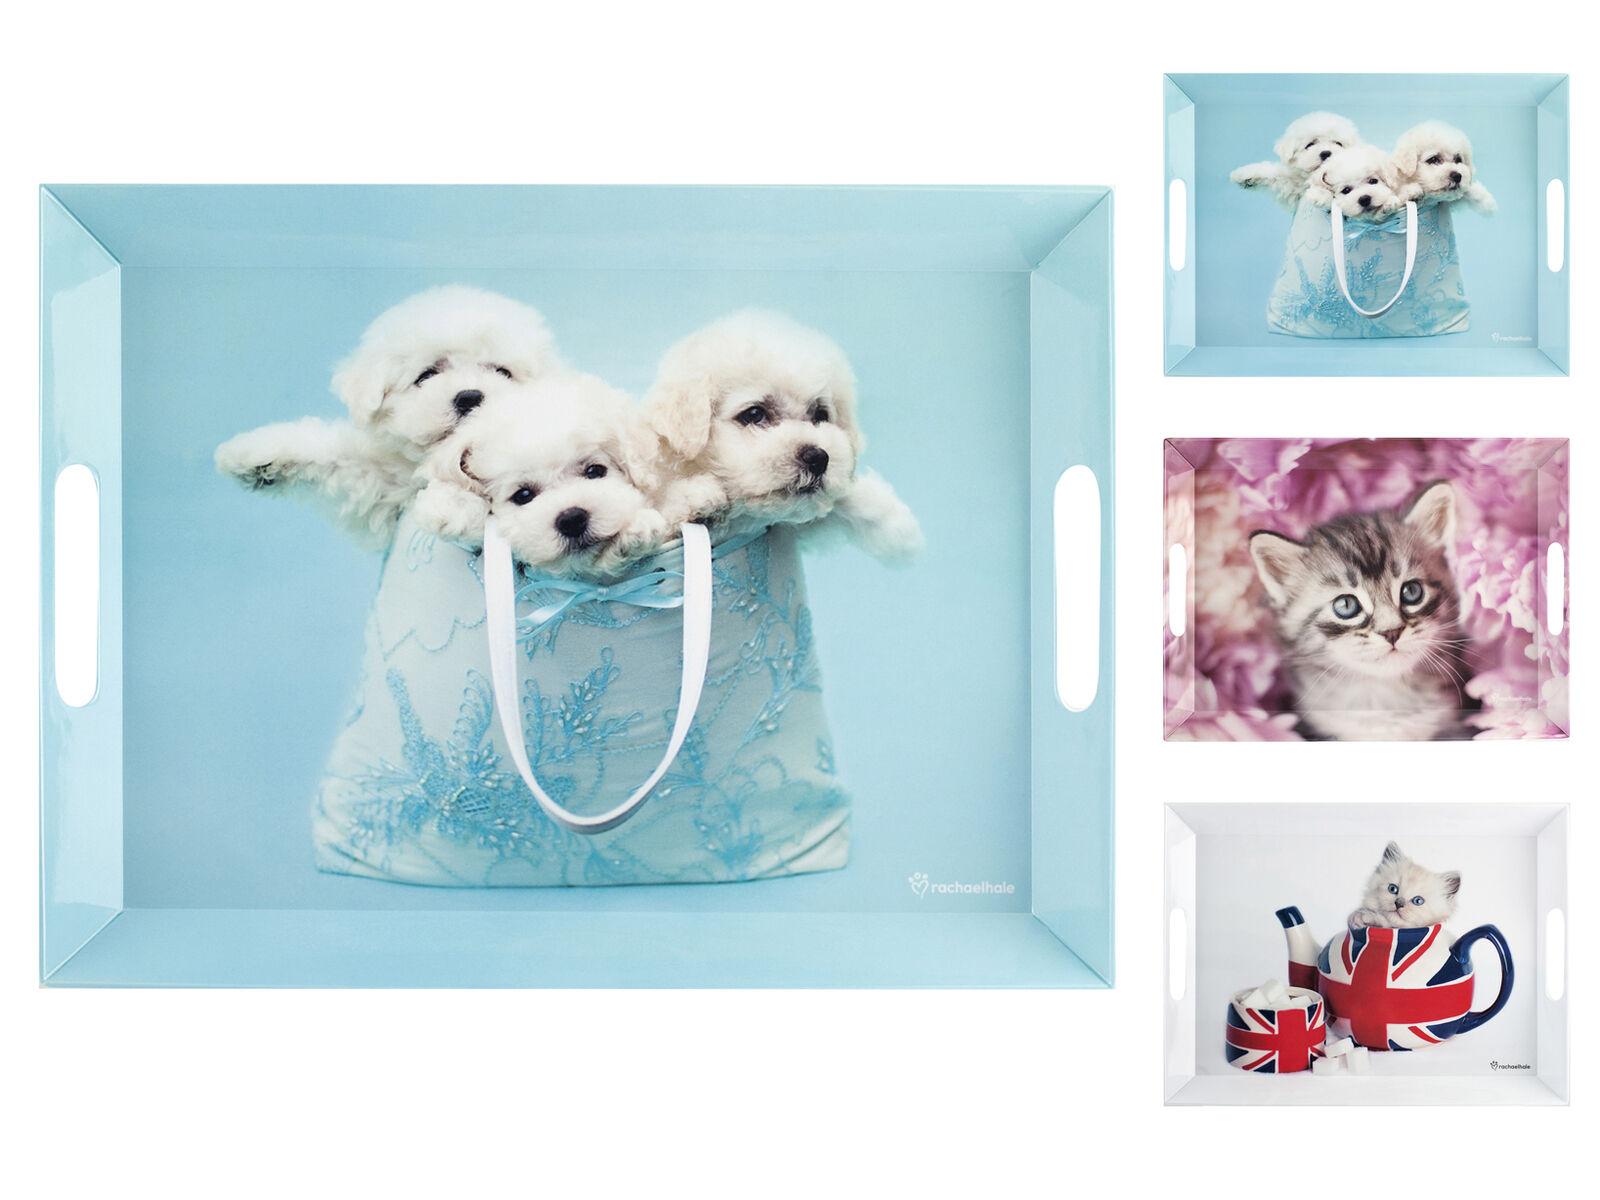 H&H Set 3 Vassoi Melamina Cats&Dogs 38X51 Complemento per la casa